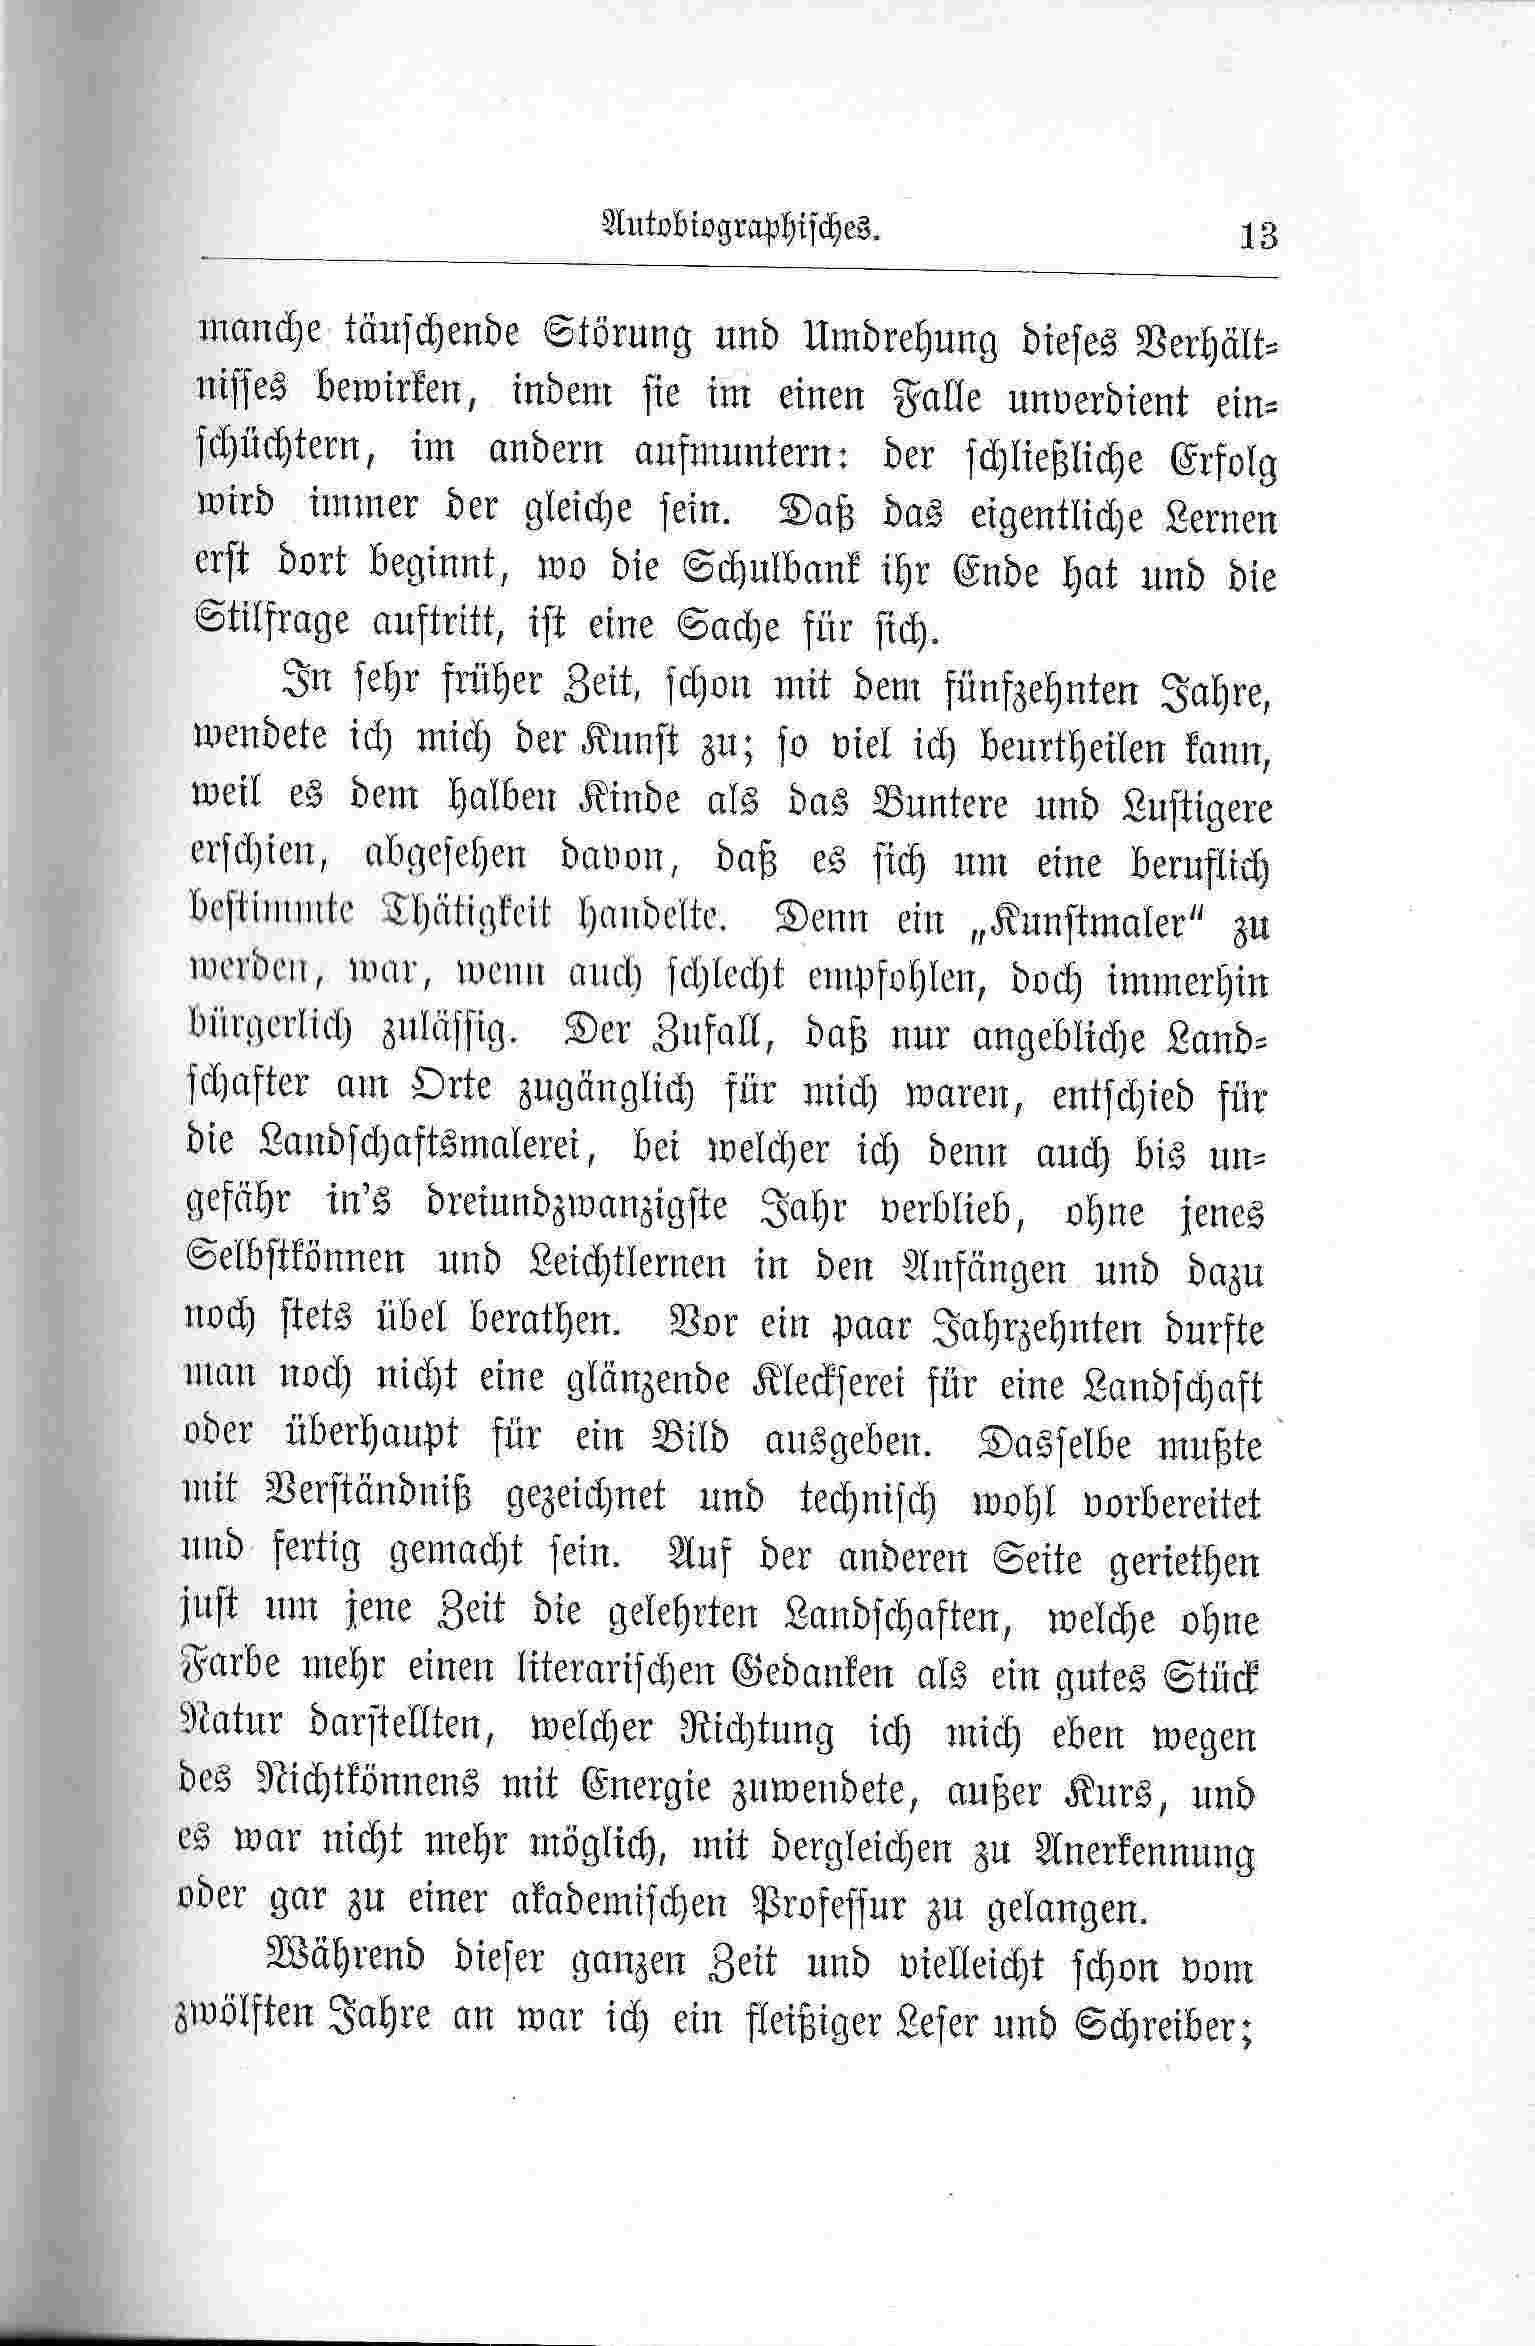 025 Essay Example Autobiography Gottfried Keller Autobiogr 13 Unusual Examples Autobiographical Incident Format Samples Full